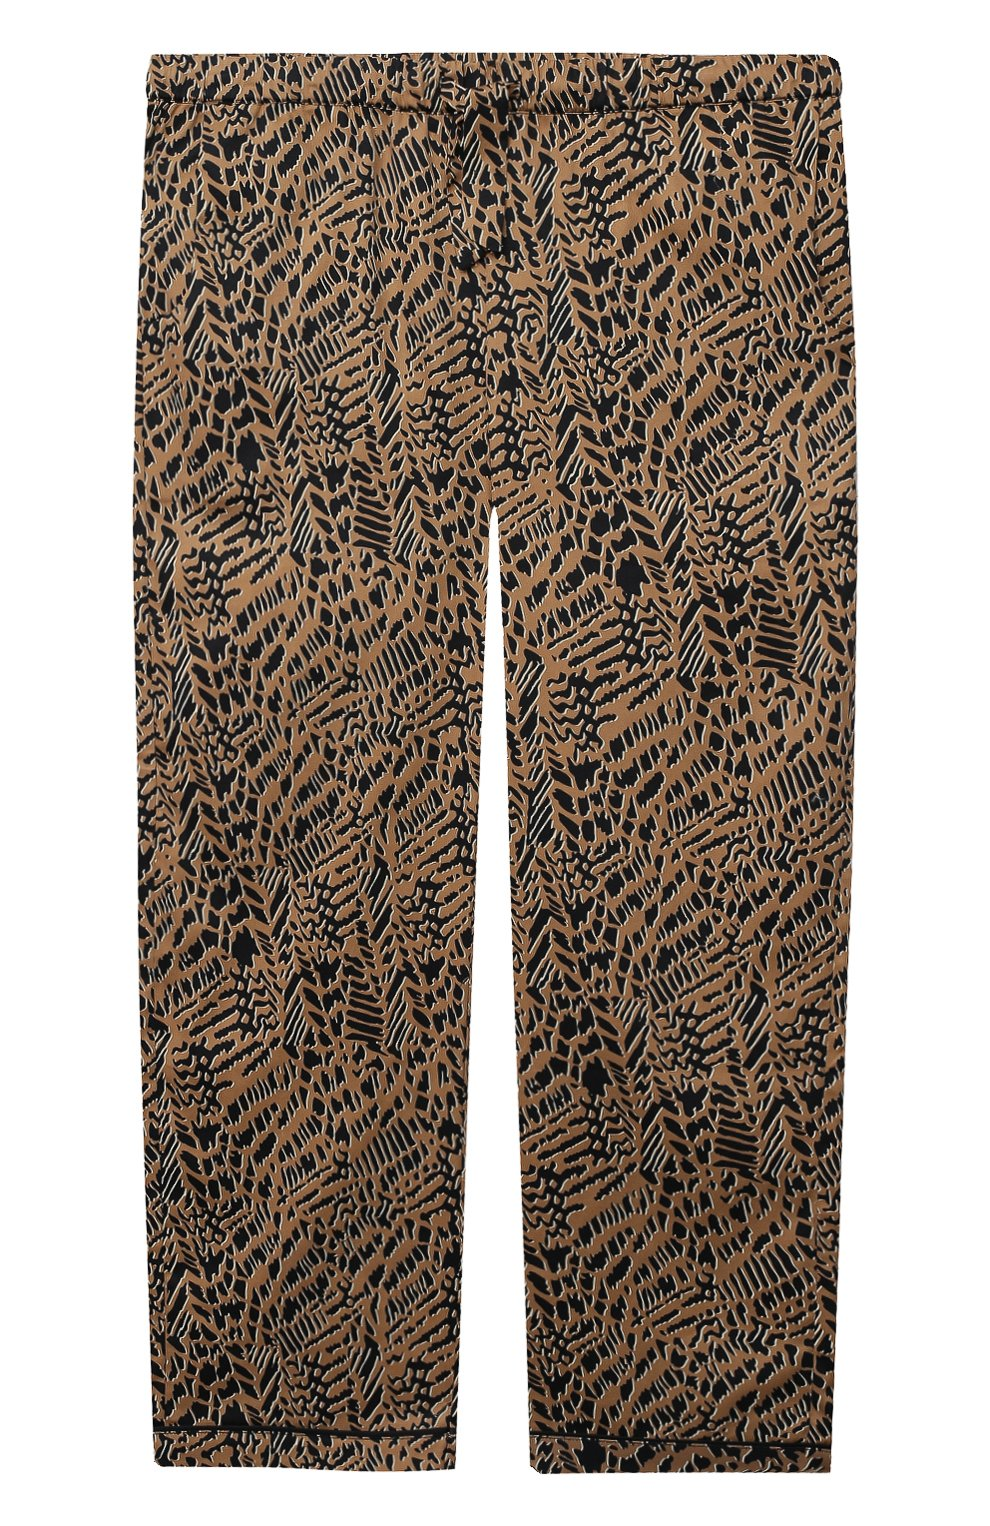 Детская хлопковая пижама LITTLE YOLKE леопардового цвета, арт. SS21-12C-AN-DI/9-12Y | Фото 4